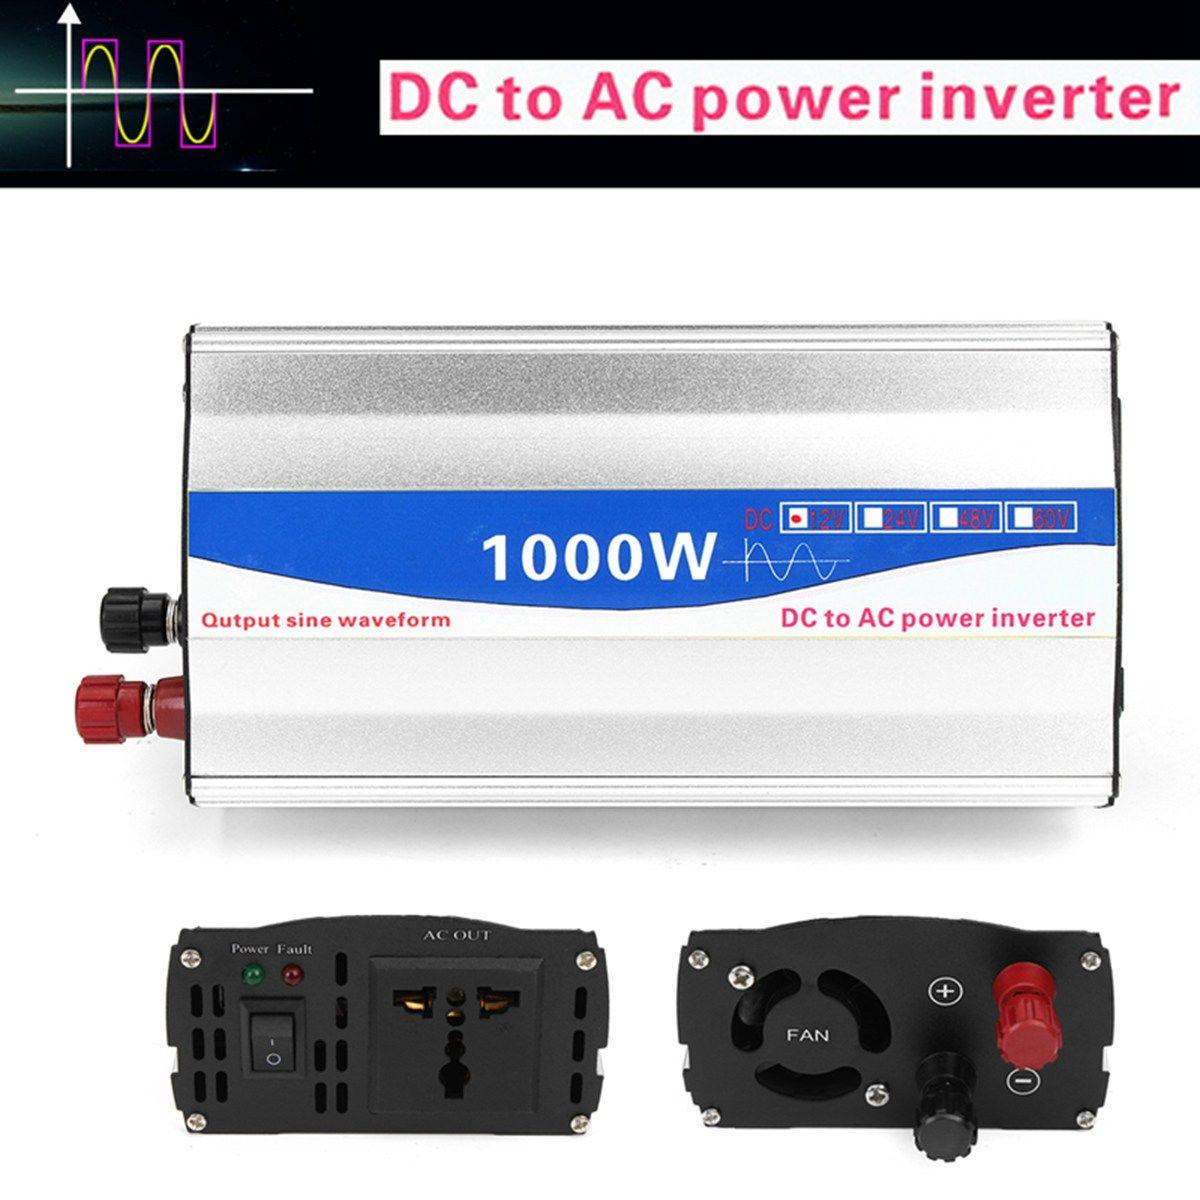 1000W Inverter DC 12V to AC 220V Pure Sine Wave Power Inverter Transmitter For Home Car Converters Supplies